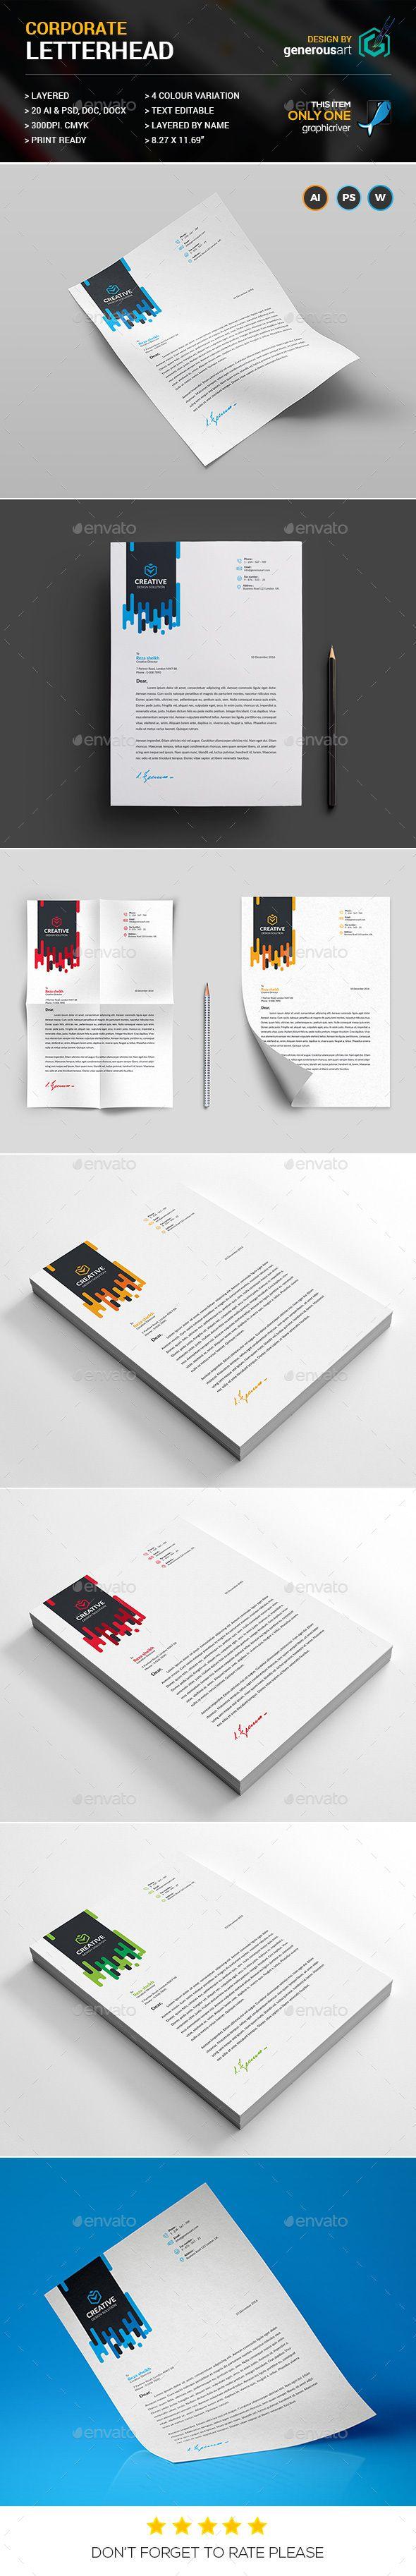 Letterhead template letterhead template template and adobe letterhead template psd ai illustrator ms word spiritdancerdesigns Images